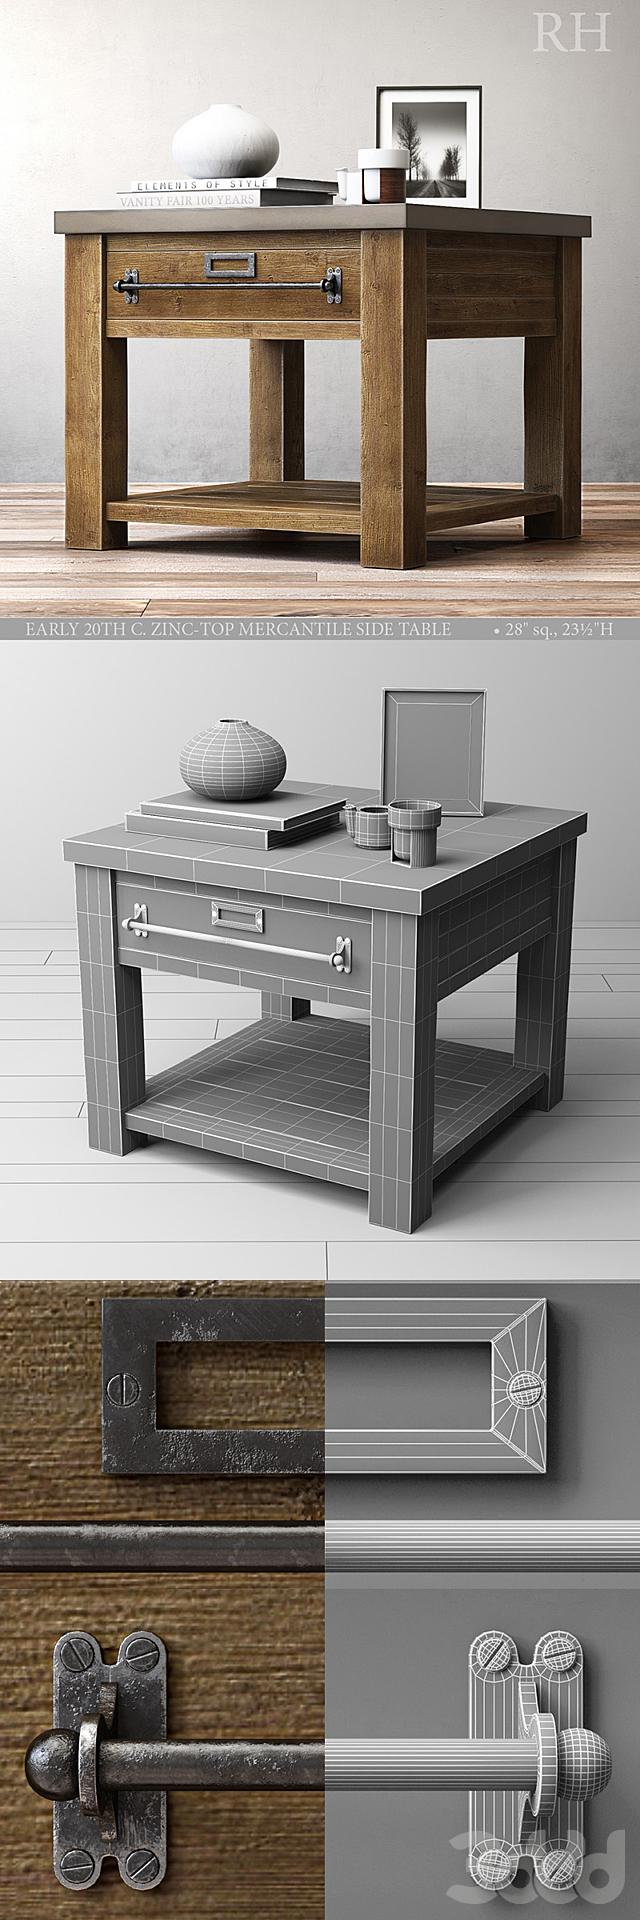 ZINC-TOP MERCANTILE SIDE TABLE 28sq